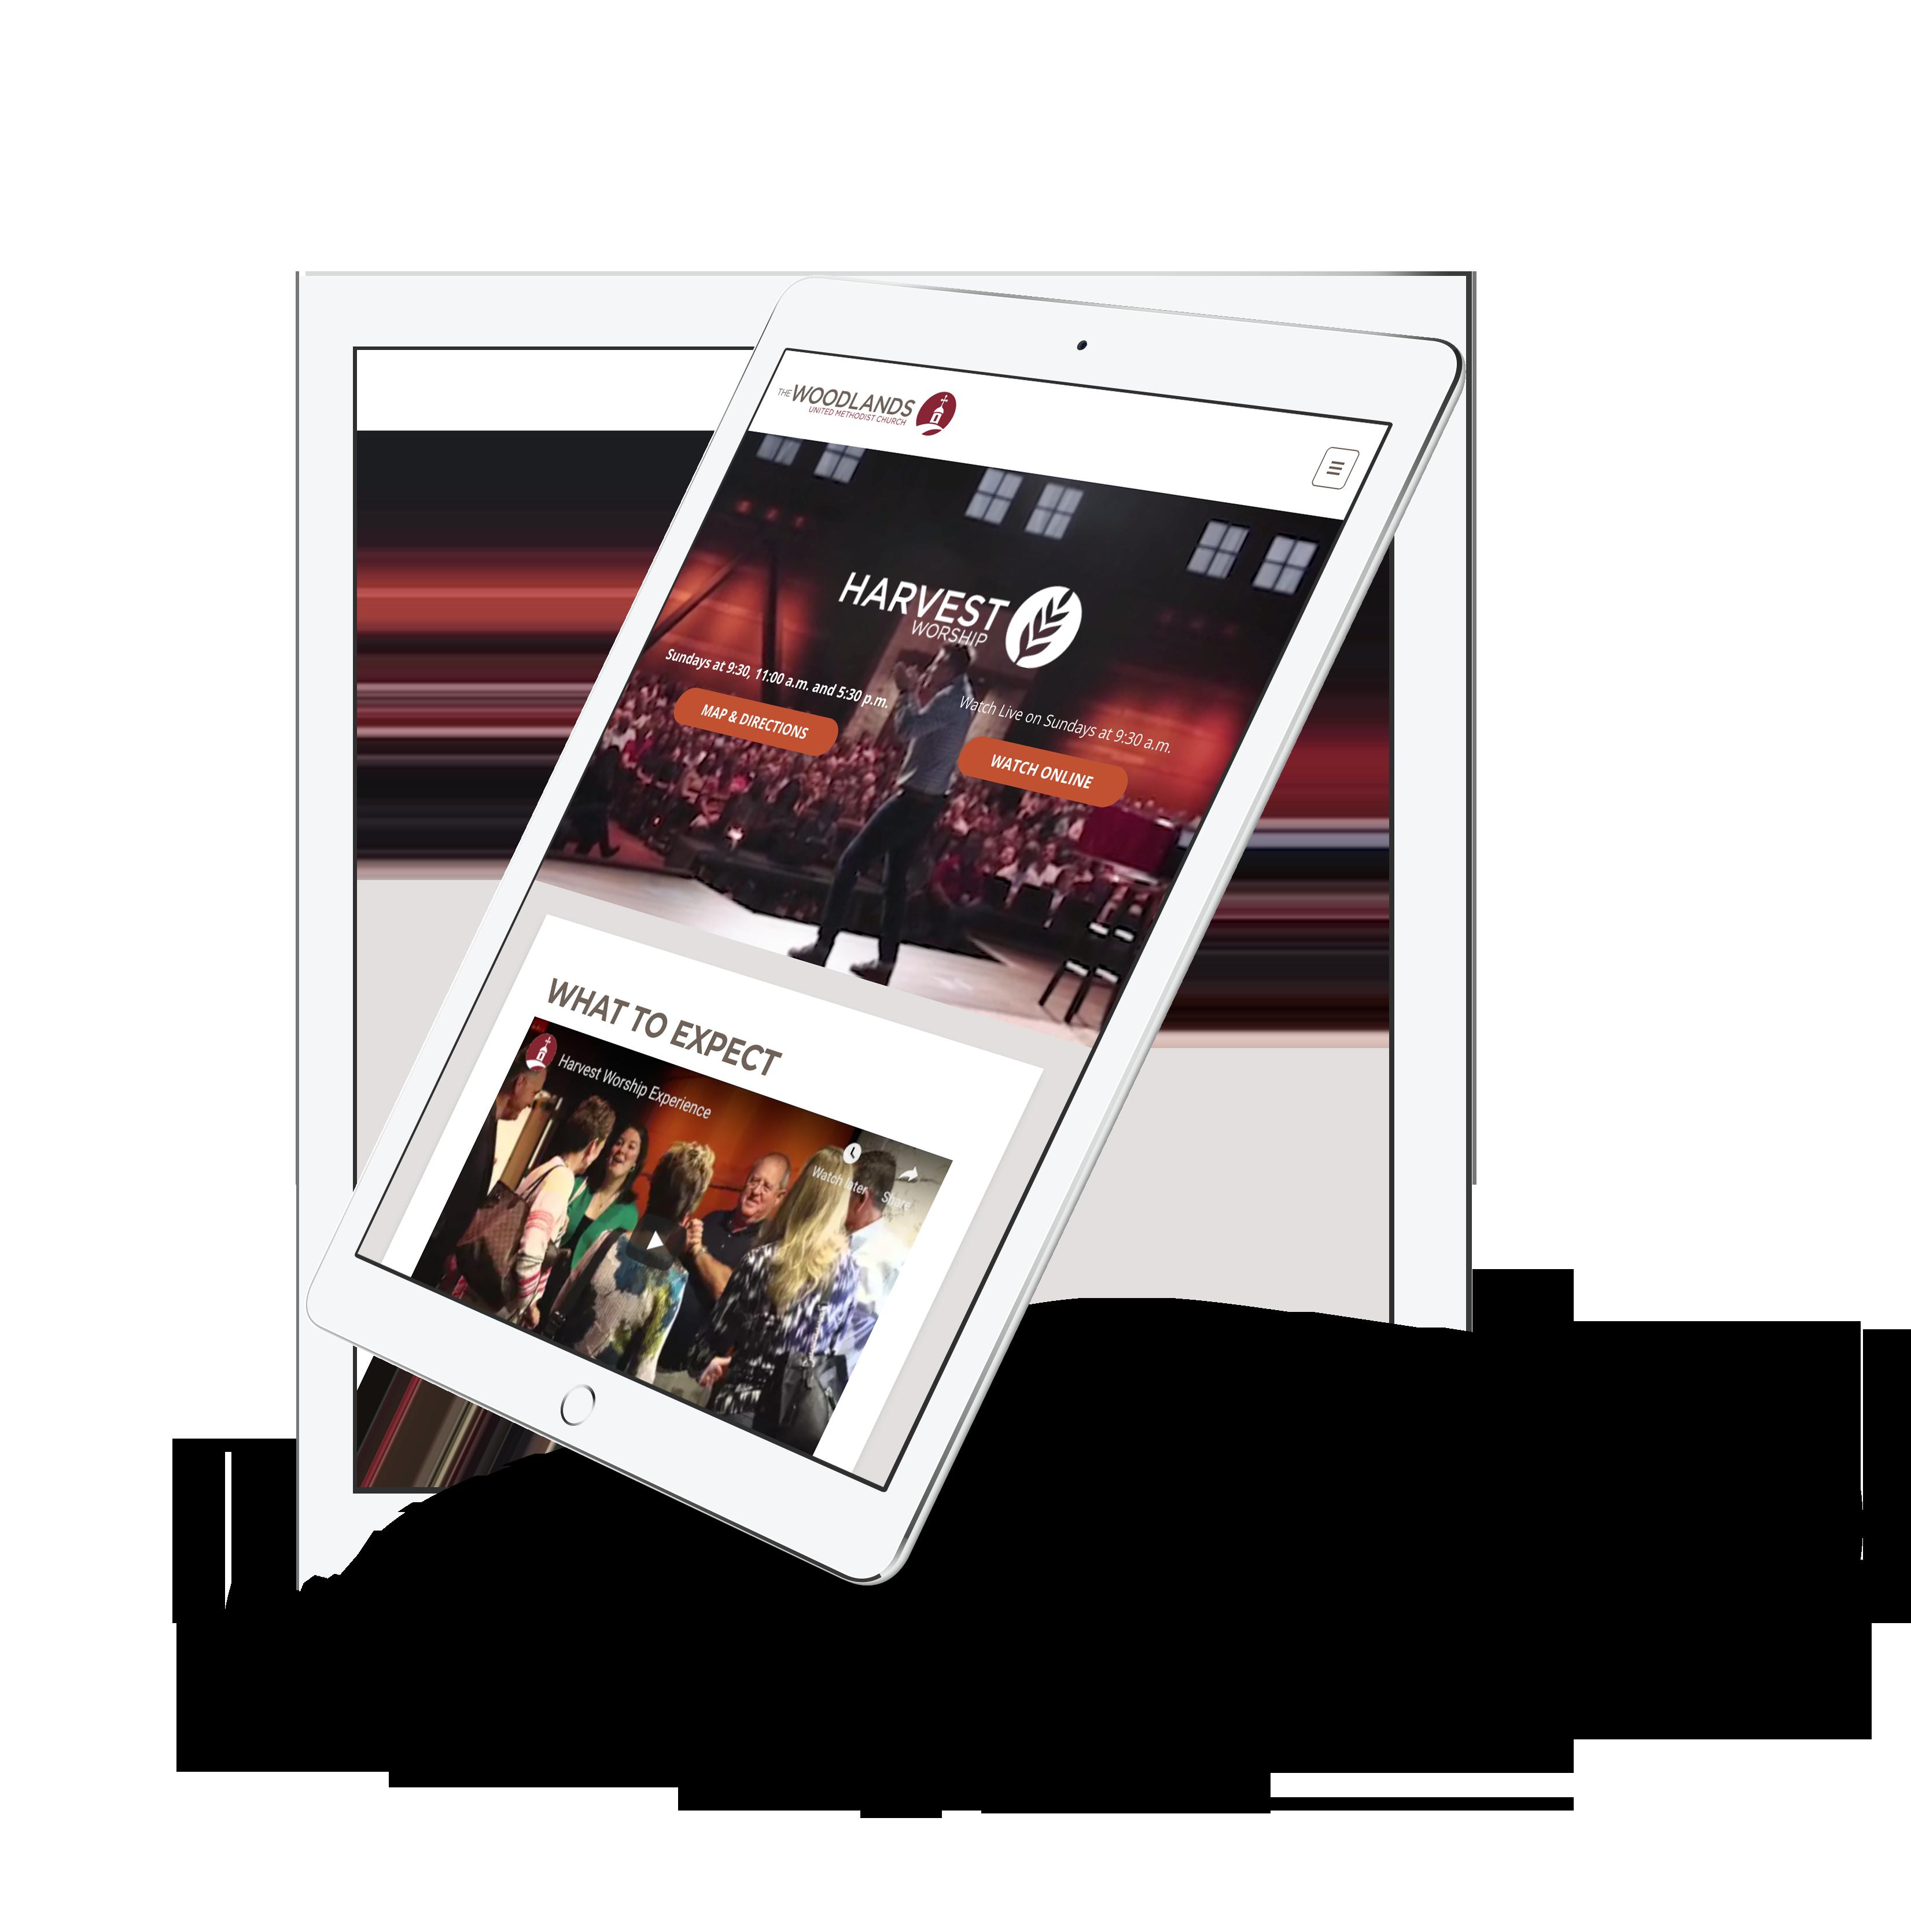 TWUMC_iPadAir2_iPadMockup_02_Portrait_Flip